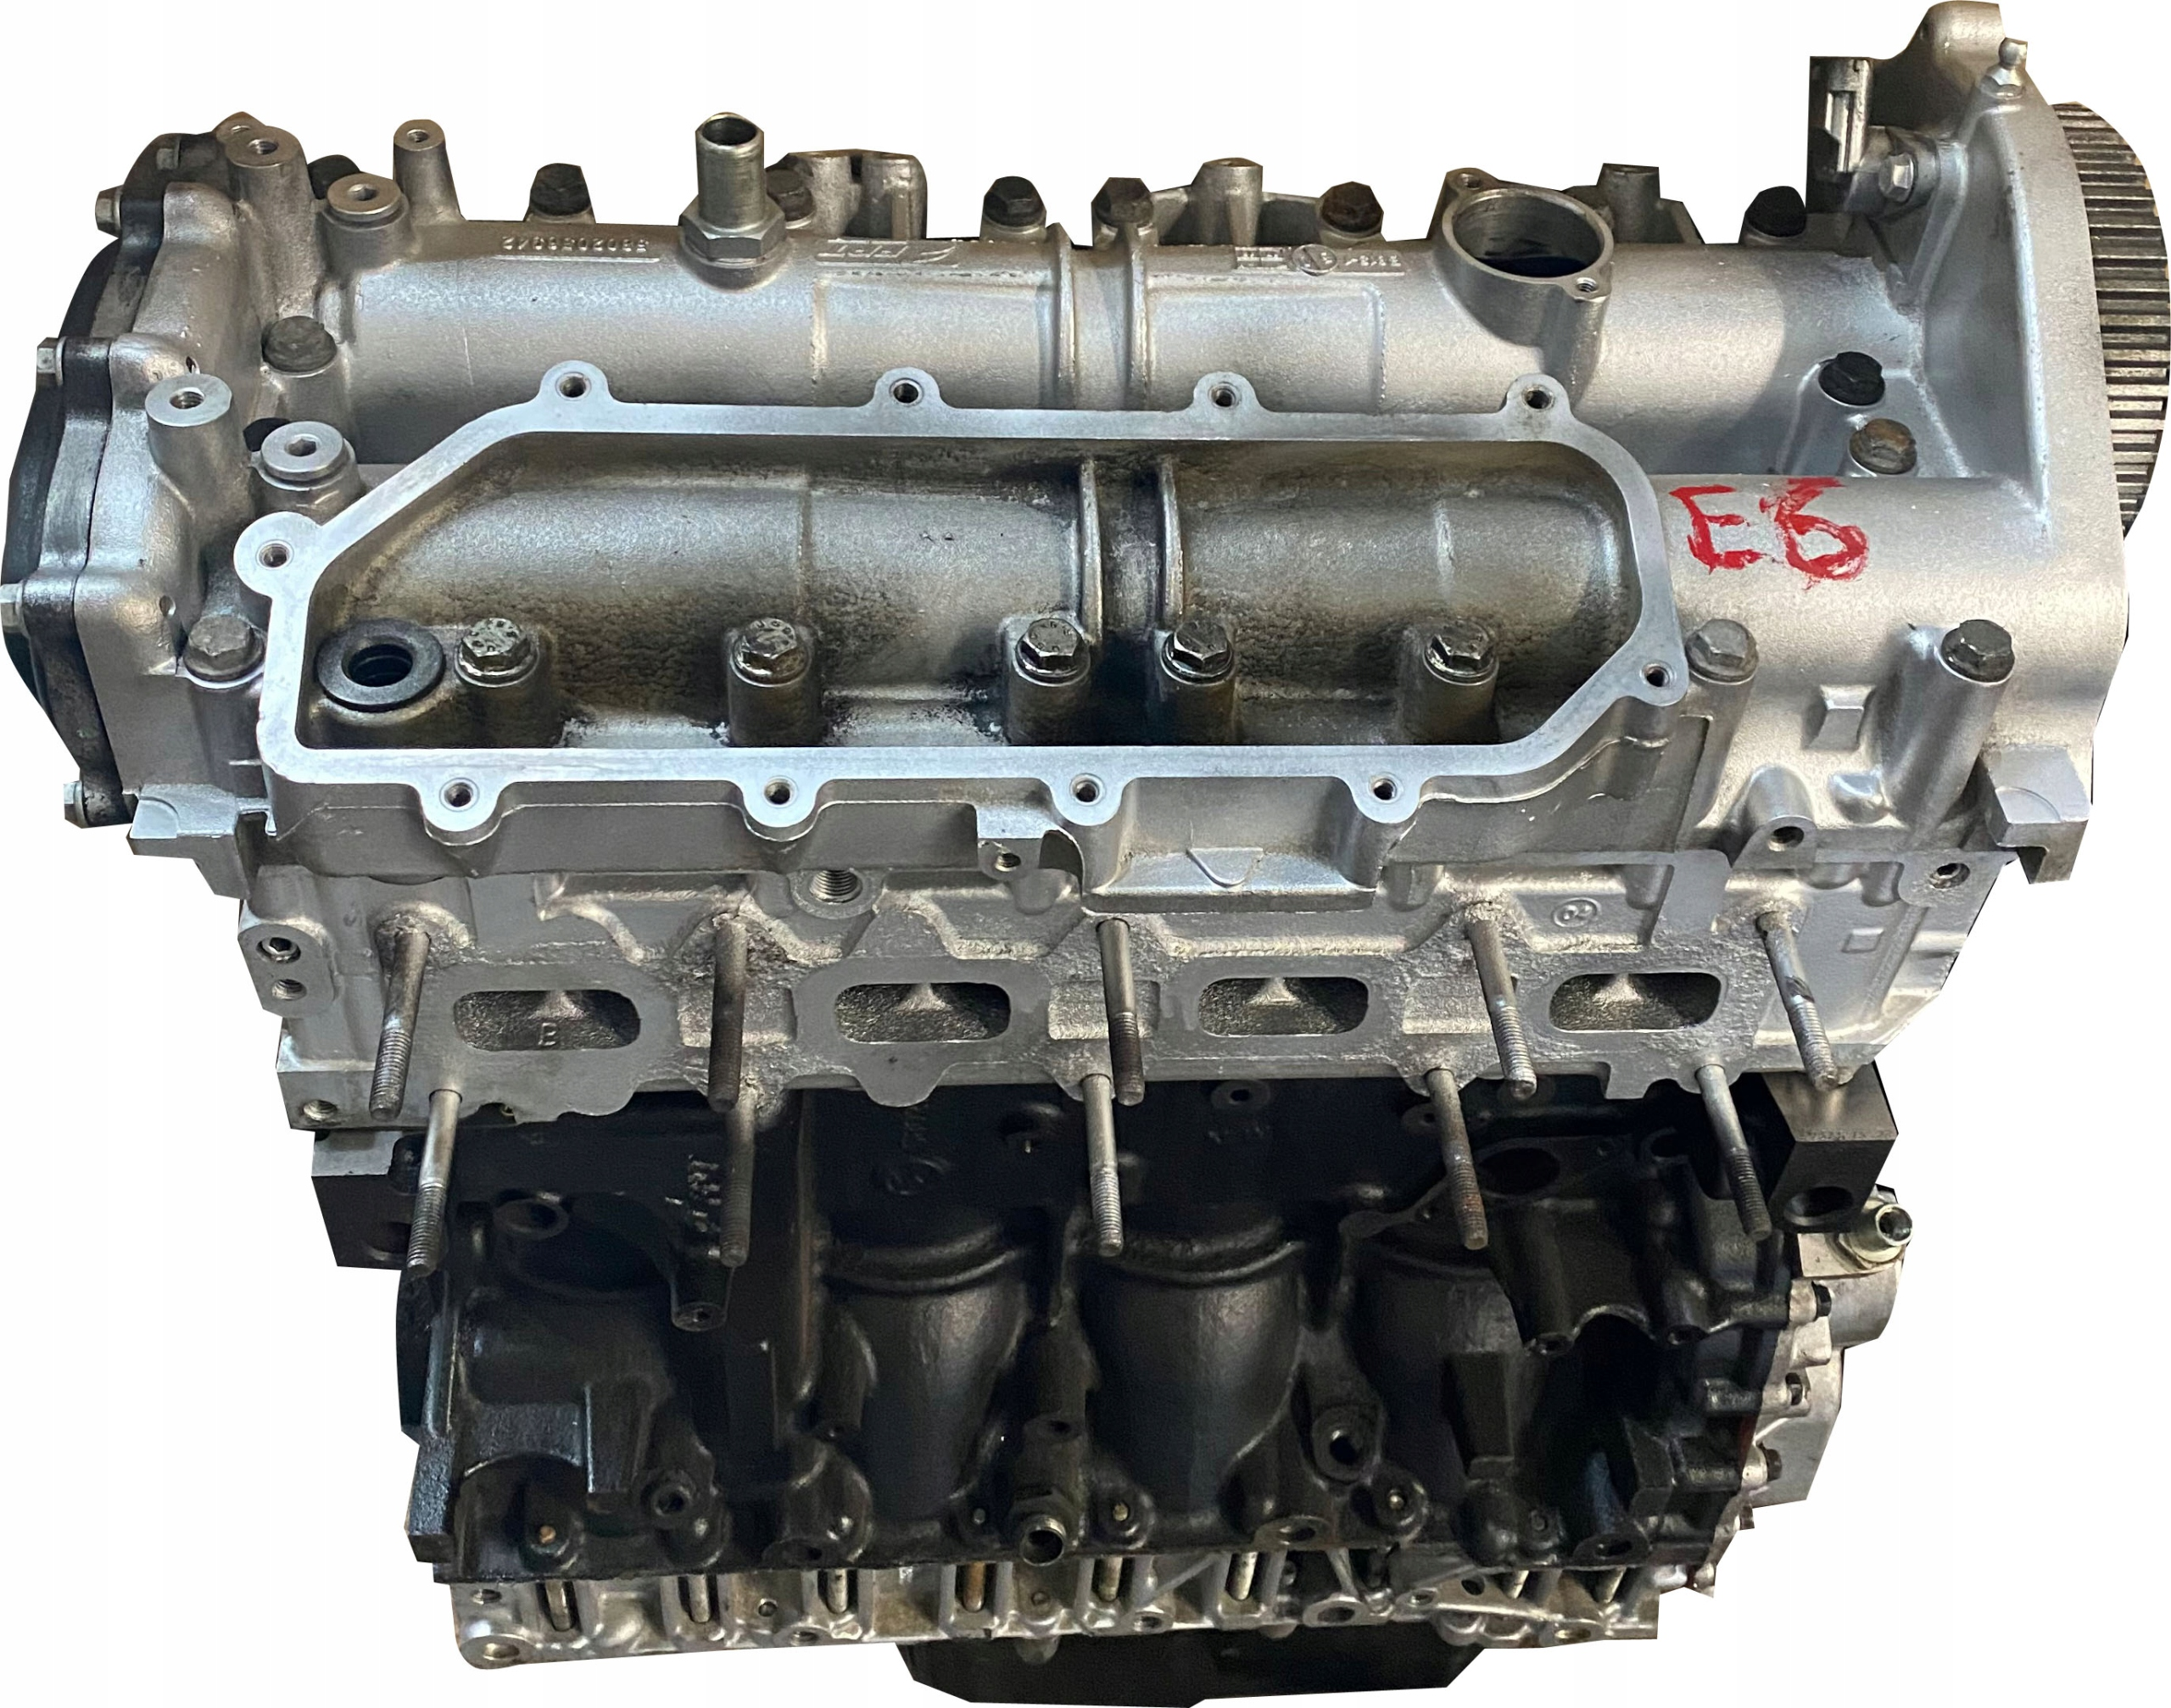 Iveco fiat ducato 2.3 jtd euro 6 двигатель 2014-2020, фото 1